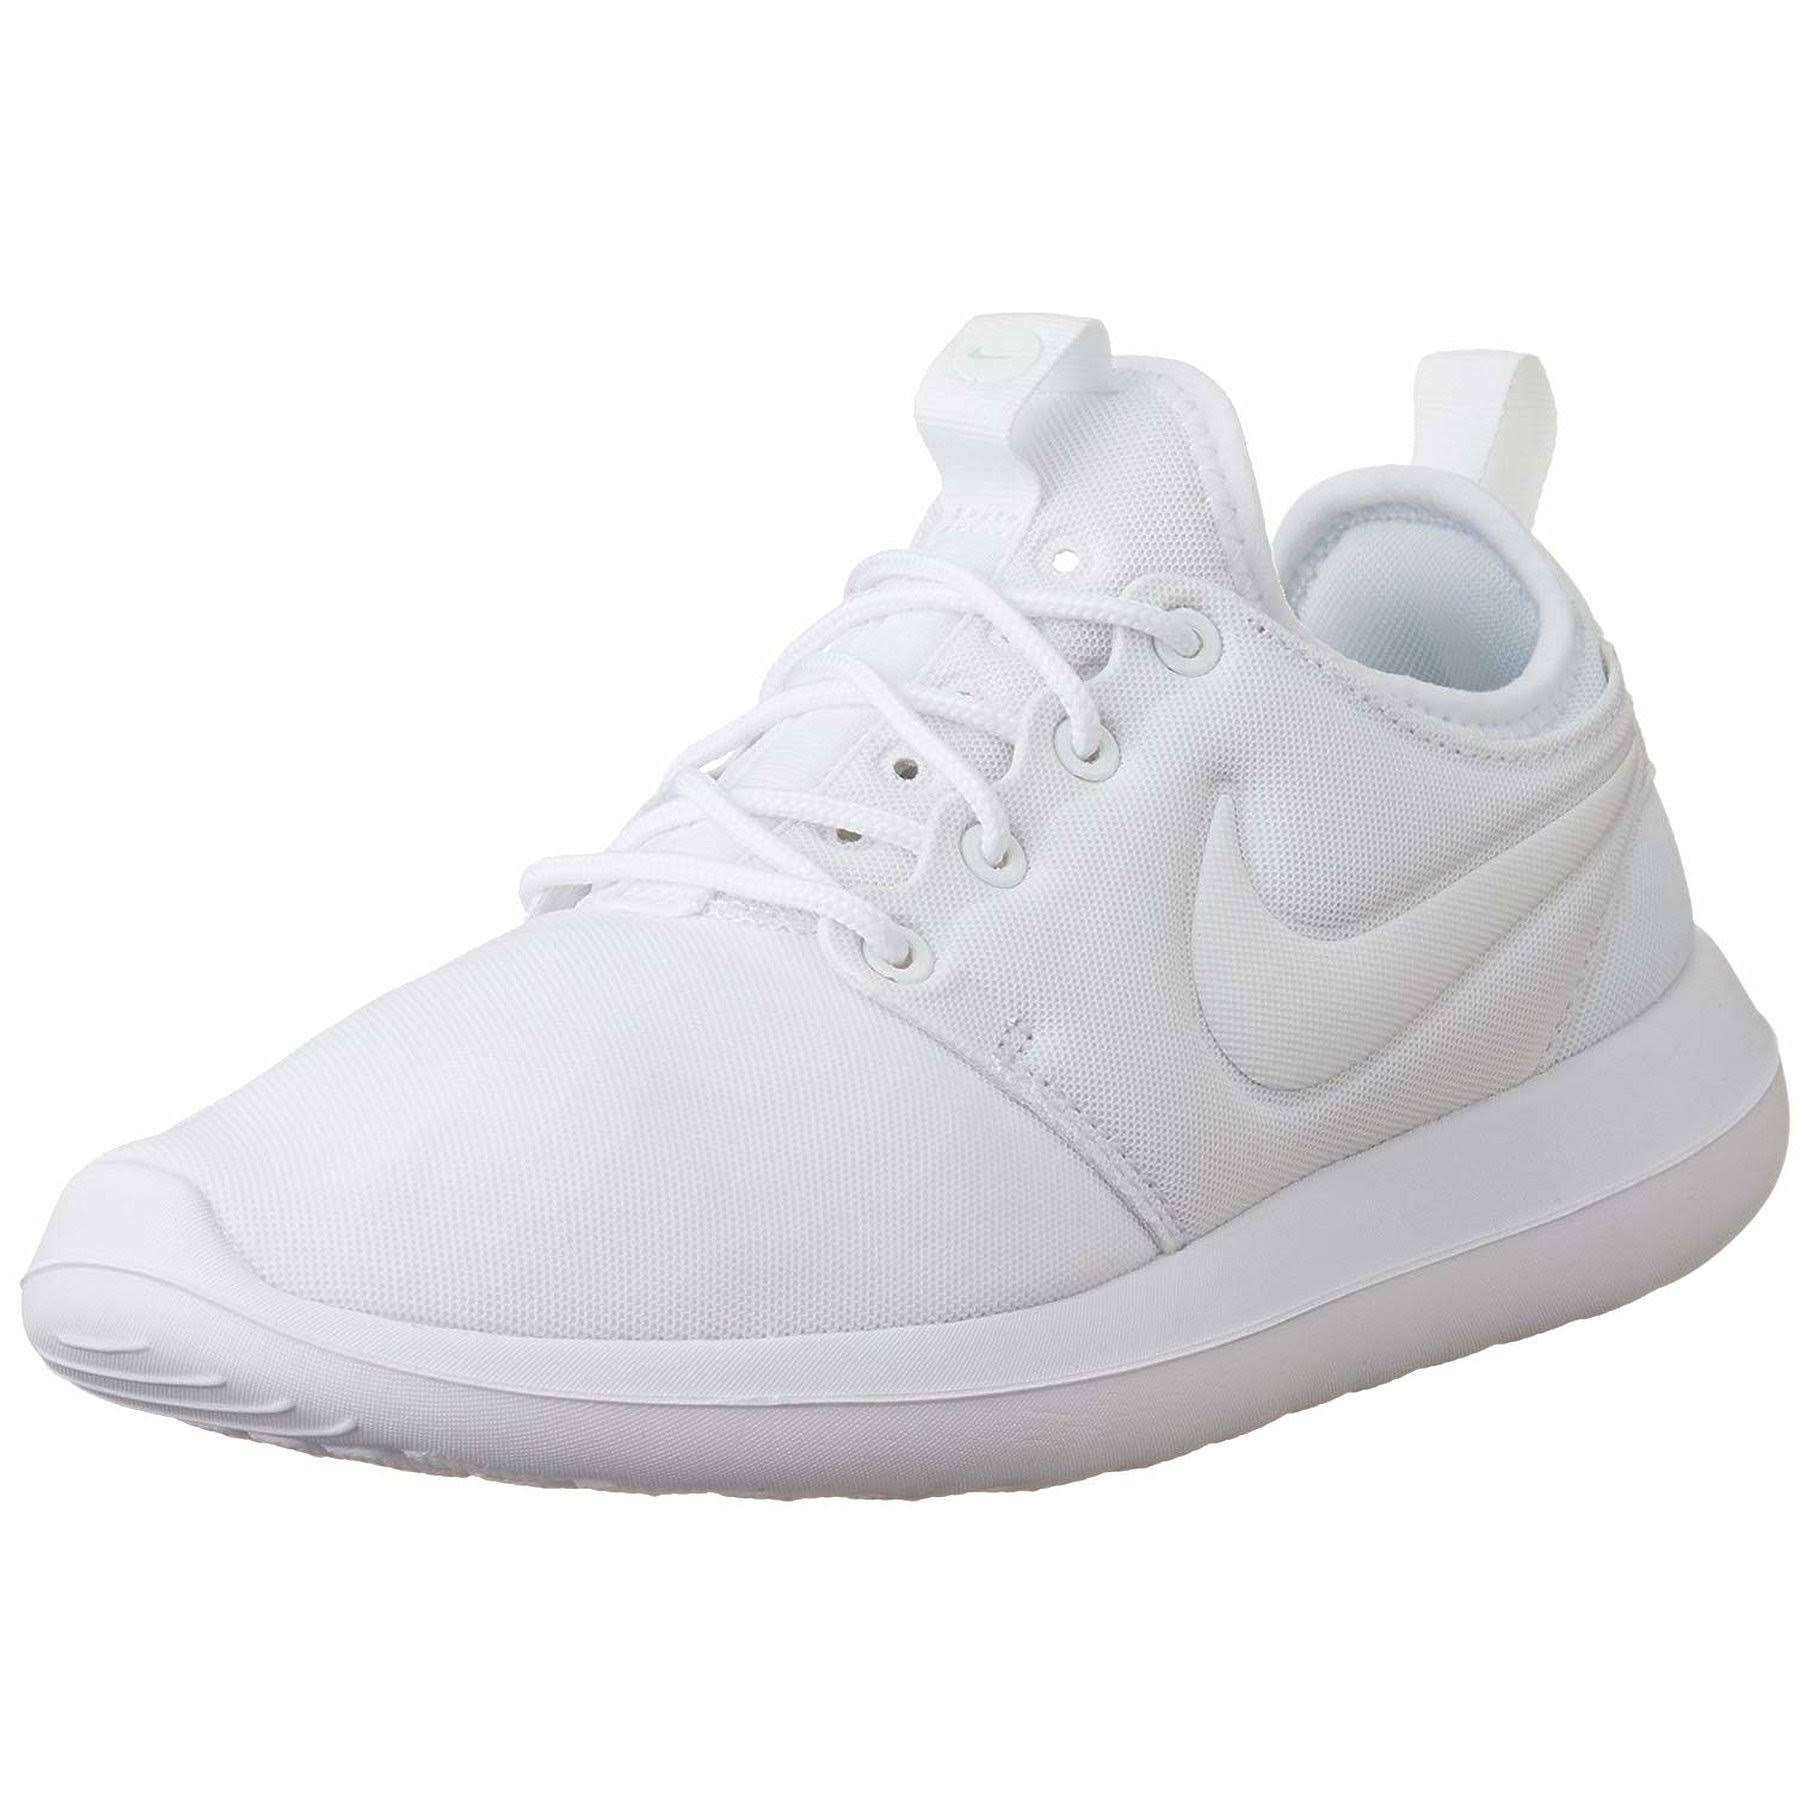 Mujer Nike Y Roshe Running 004 Negras Para Negras Two De Zapatillas zqESPYq